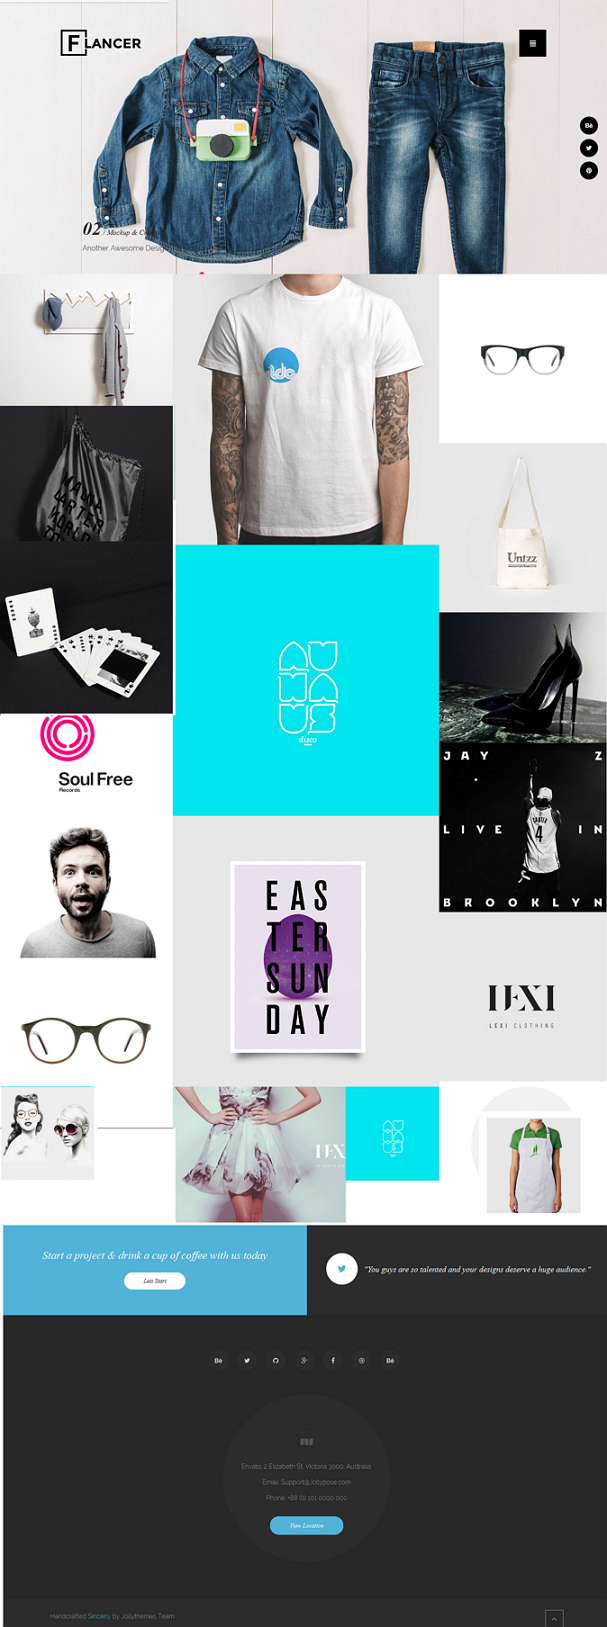 Flancer is a creative design, new trendy portfolio concept for agencies, freelancers, graphic de ...